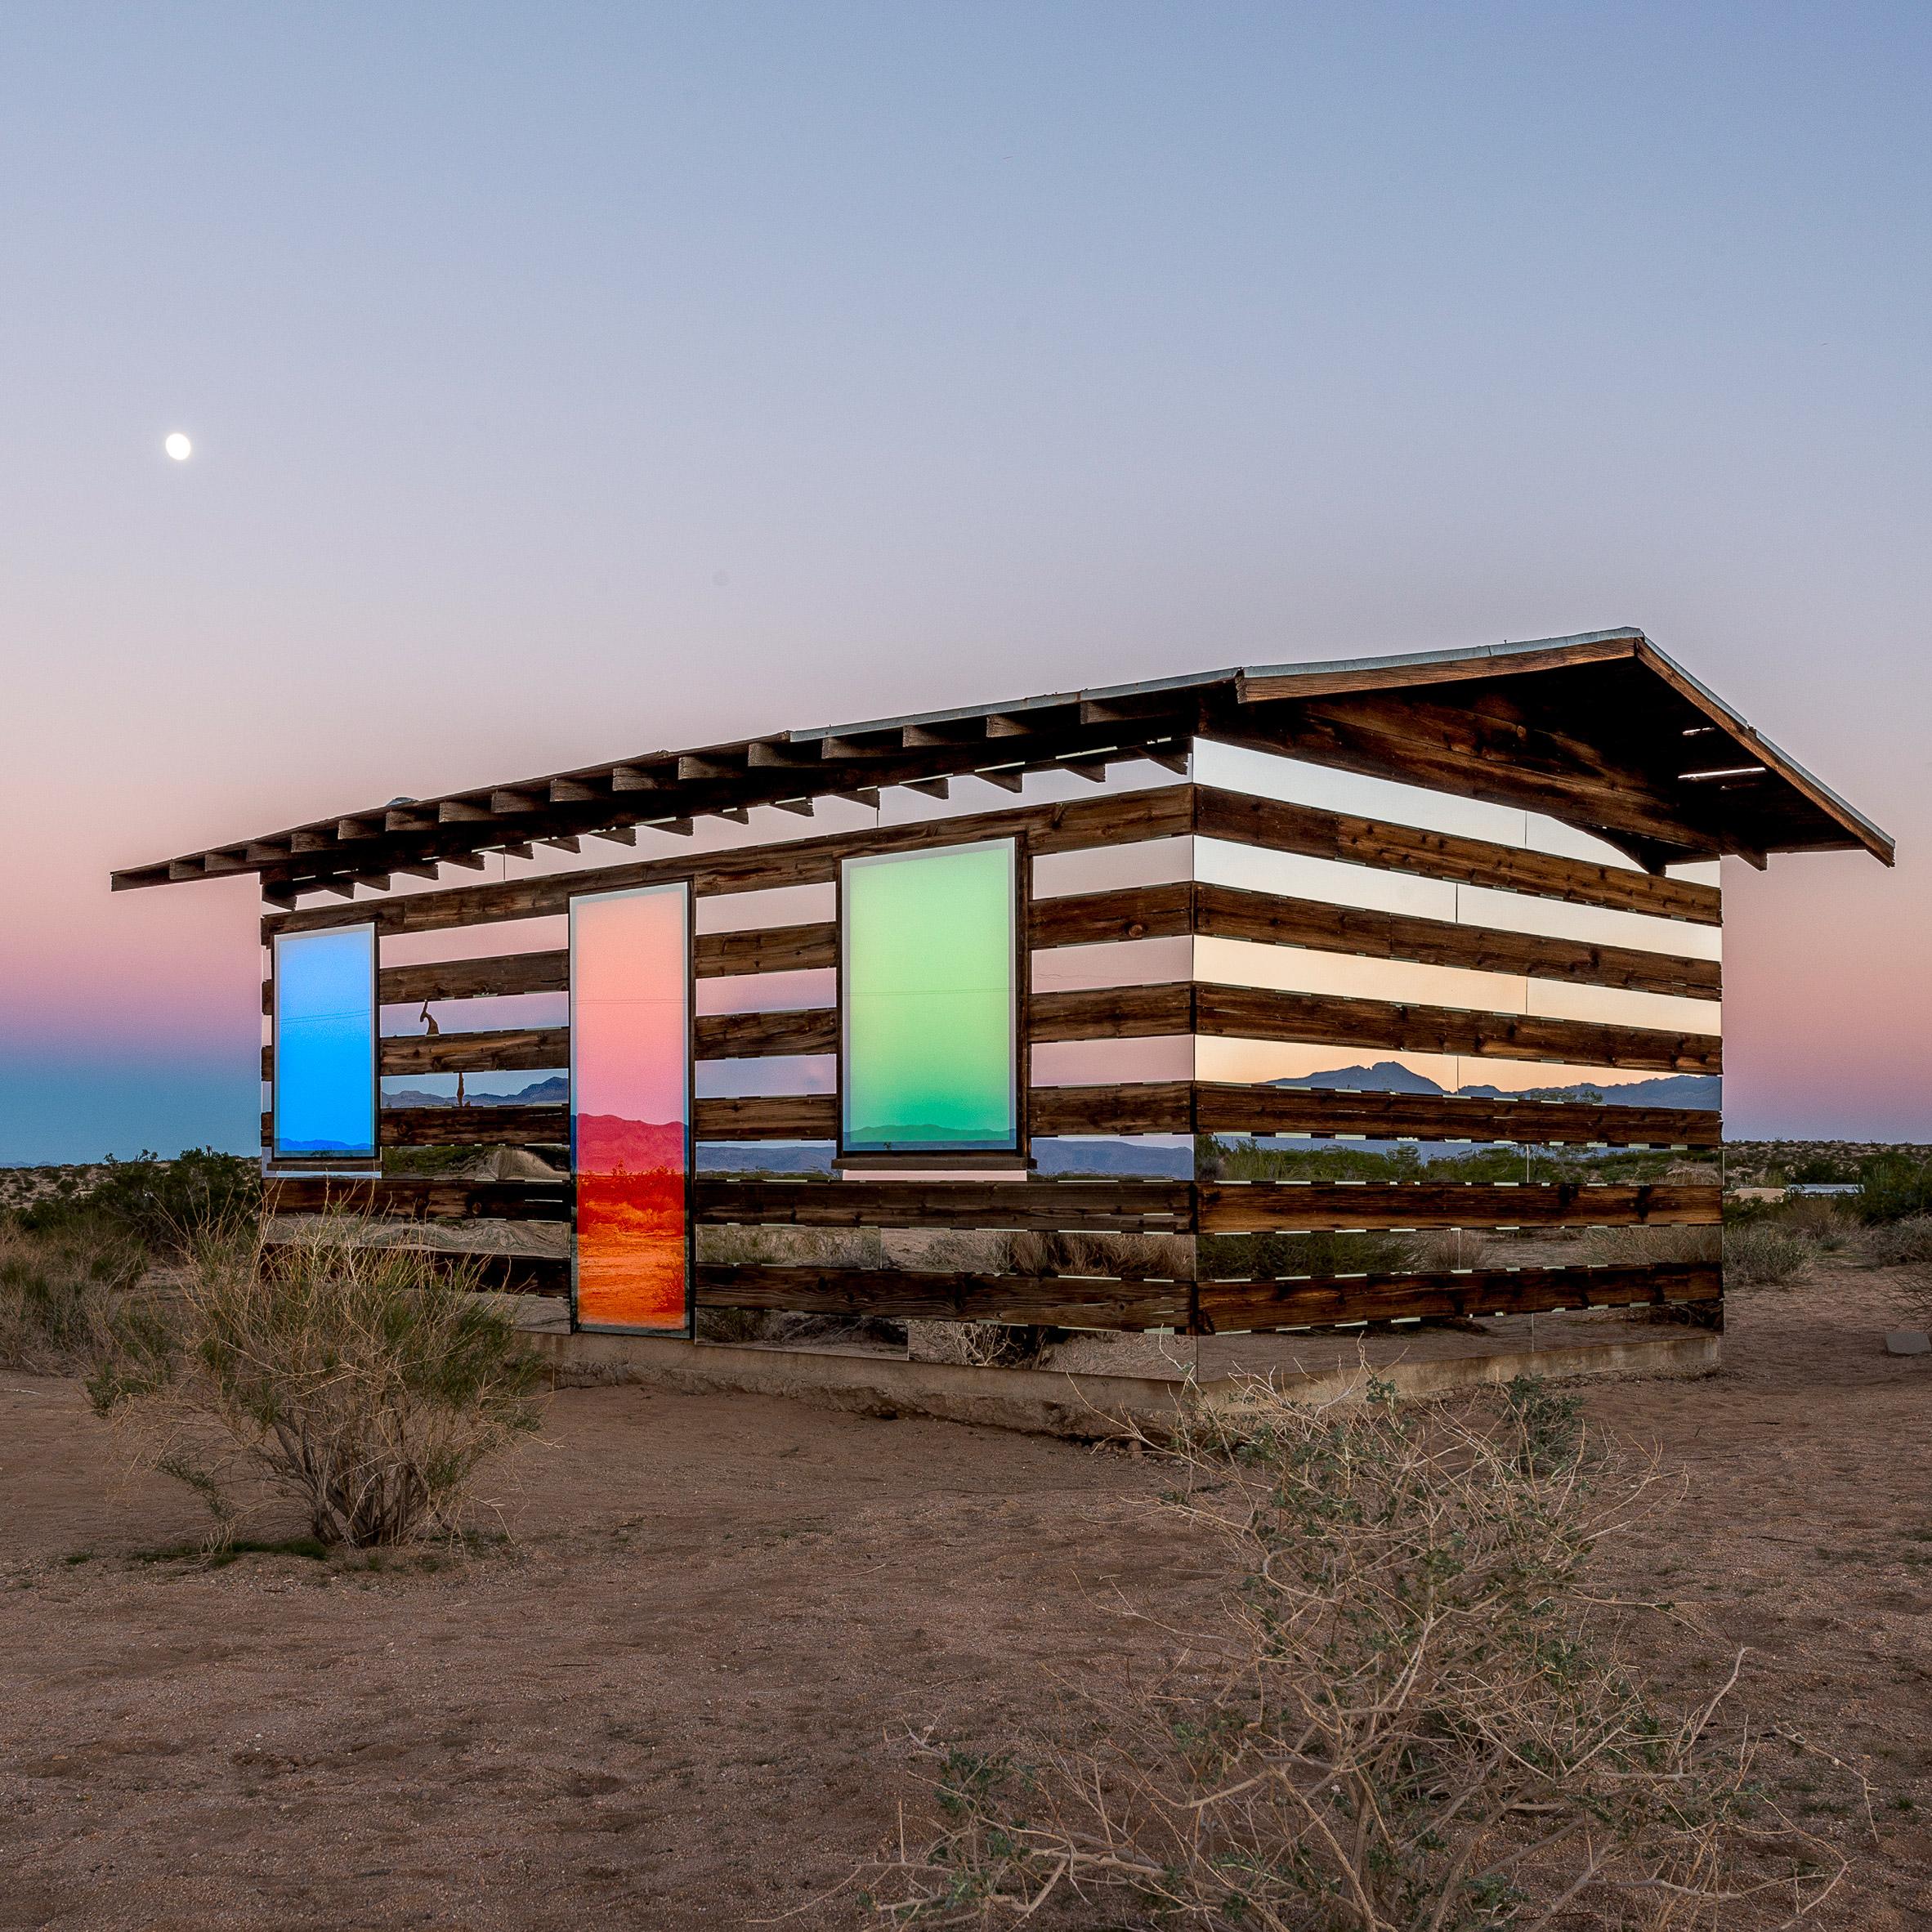 Five key projects by artist Phillip K Smith III